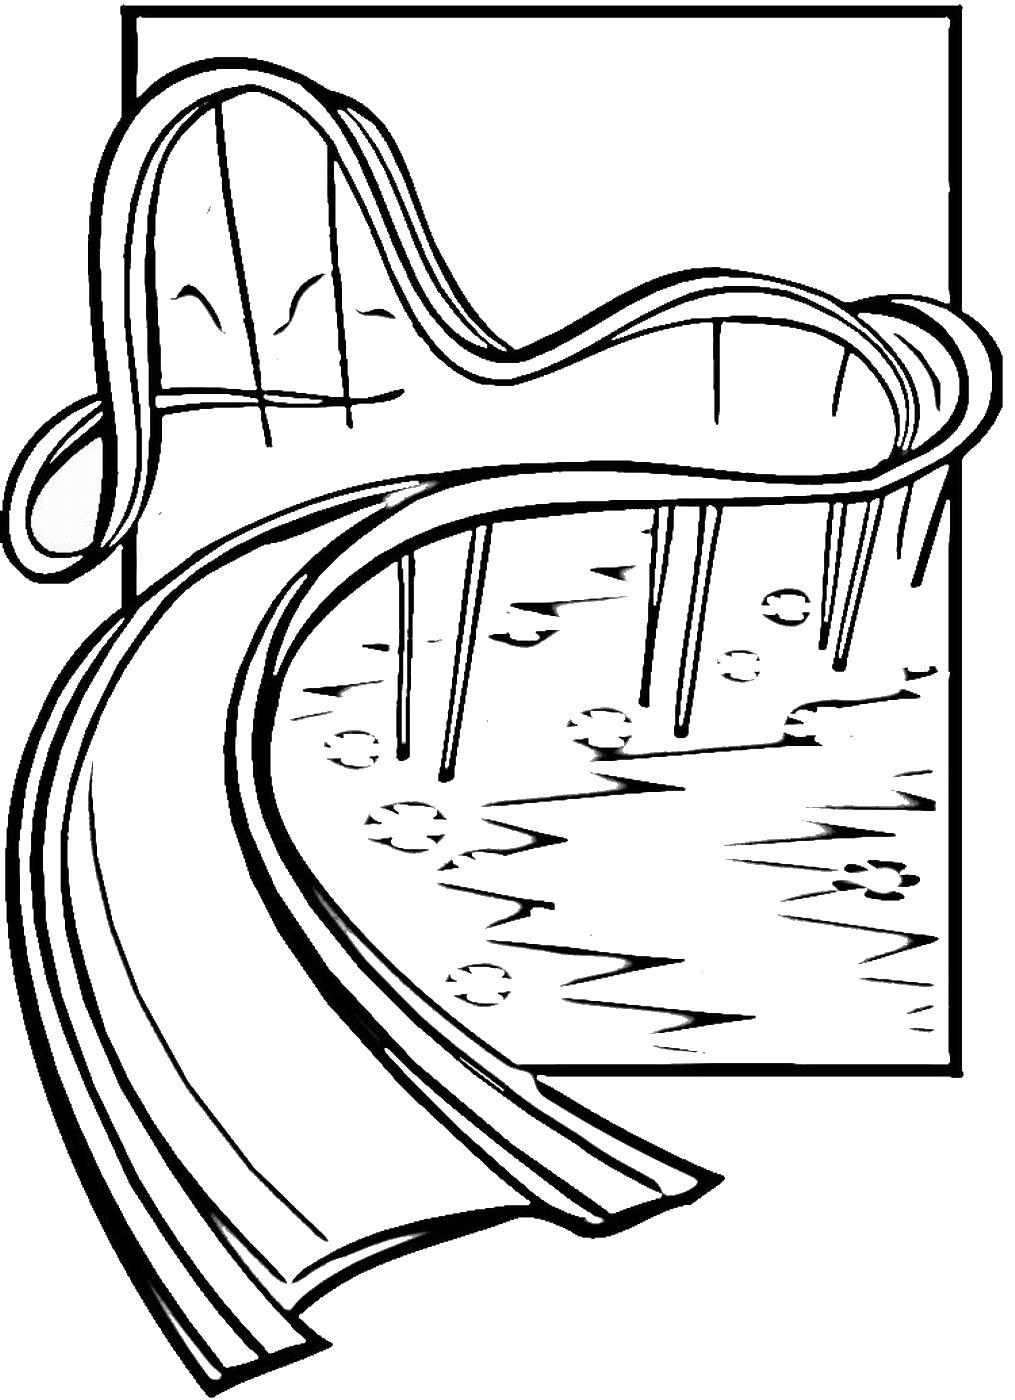 1015x1400 Amusement Park Coloring Pages Luxury Water Park Coloring Pages